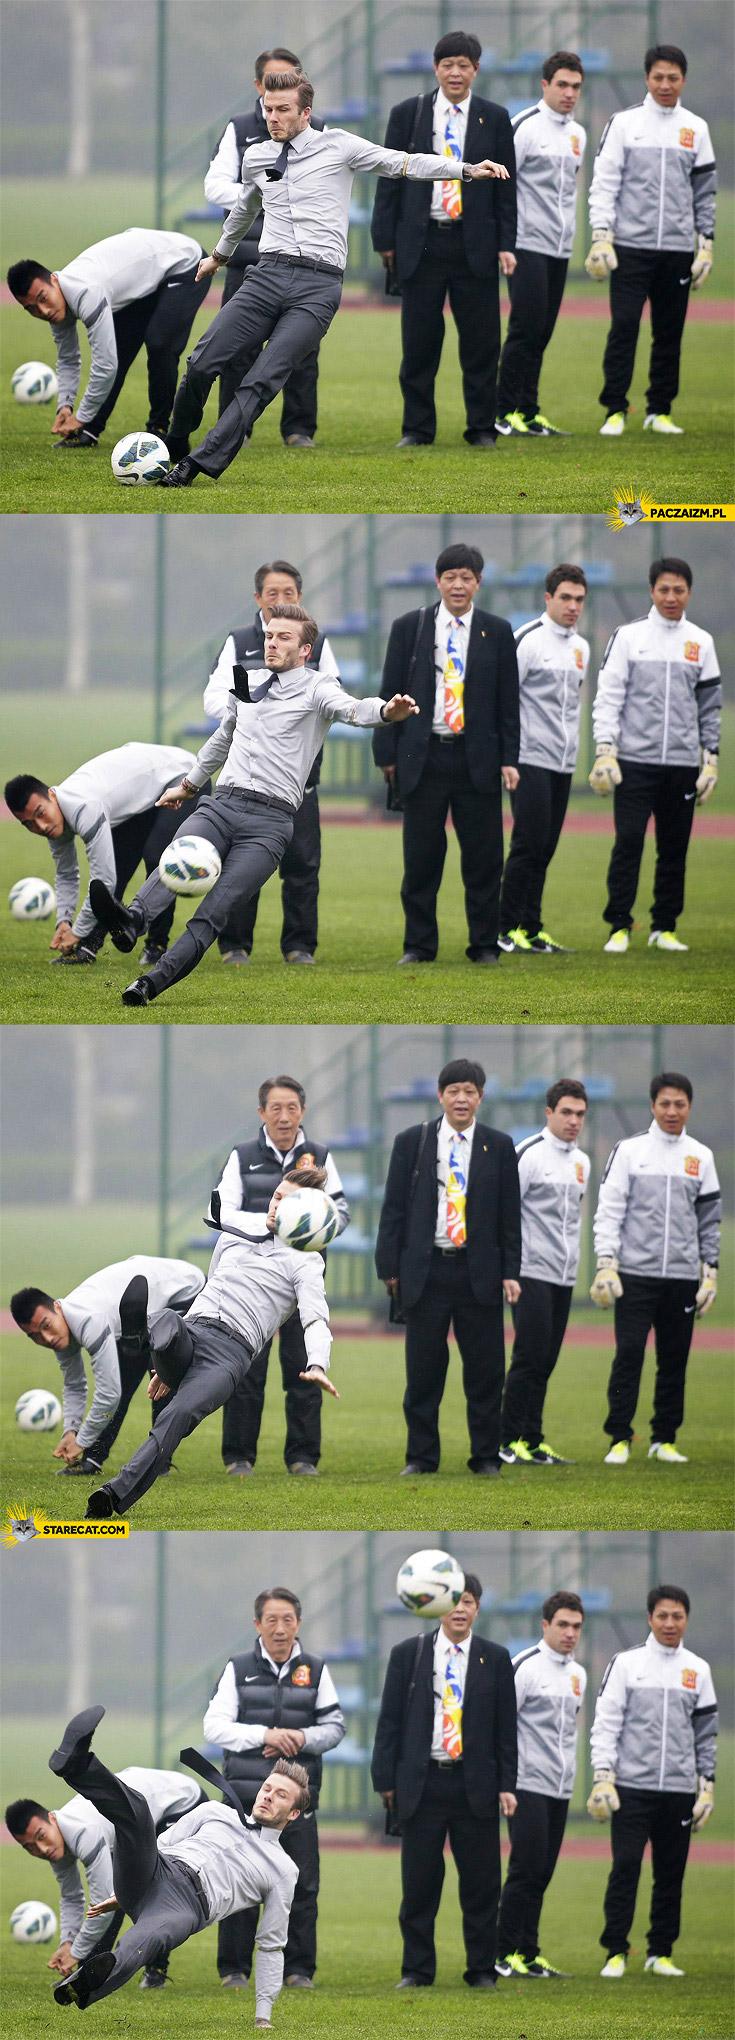 David Beckham collapses falls after free kick